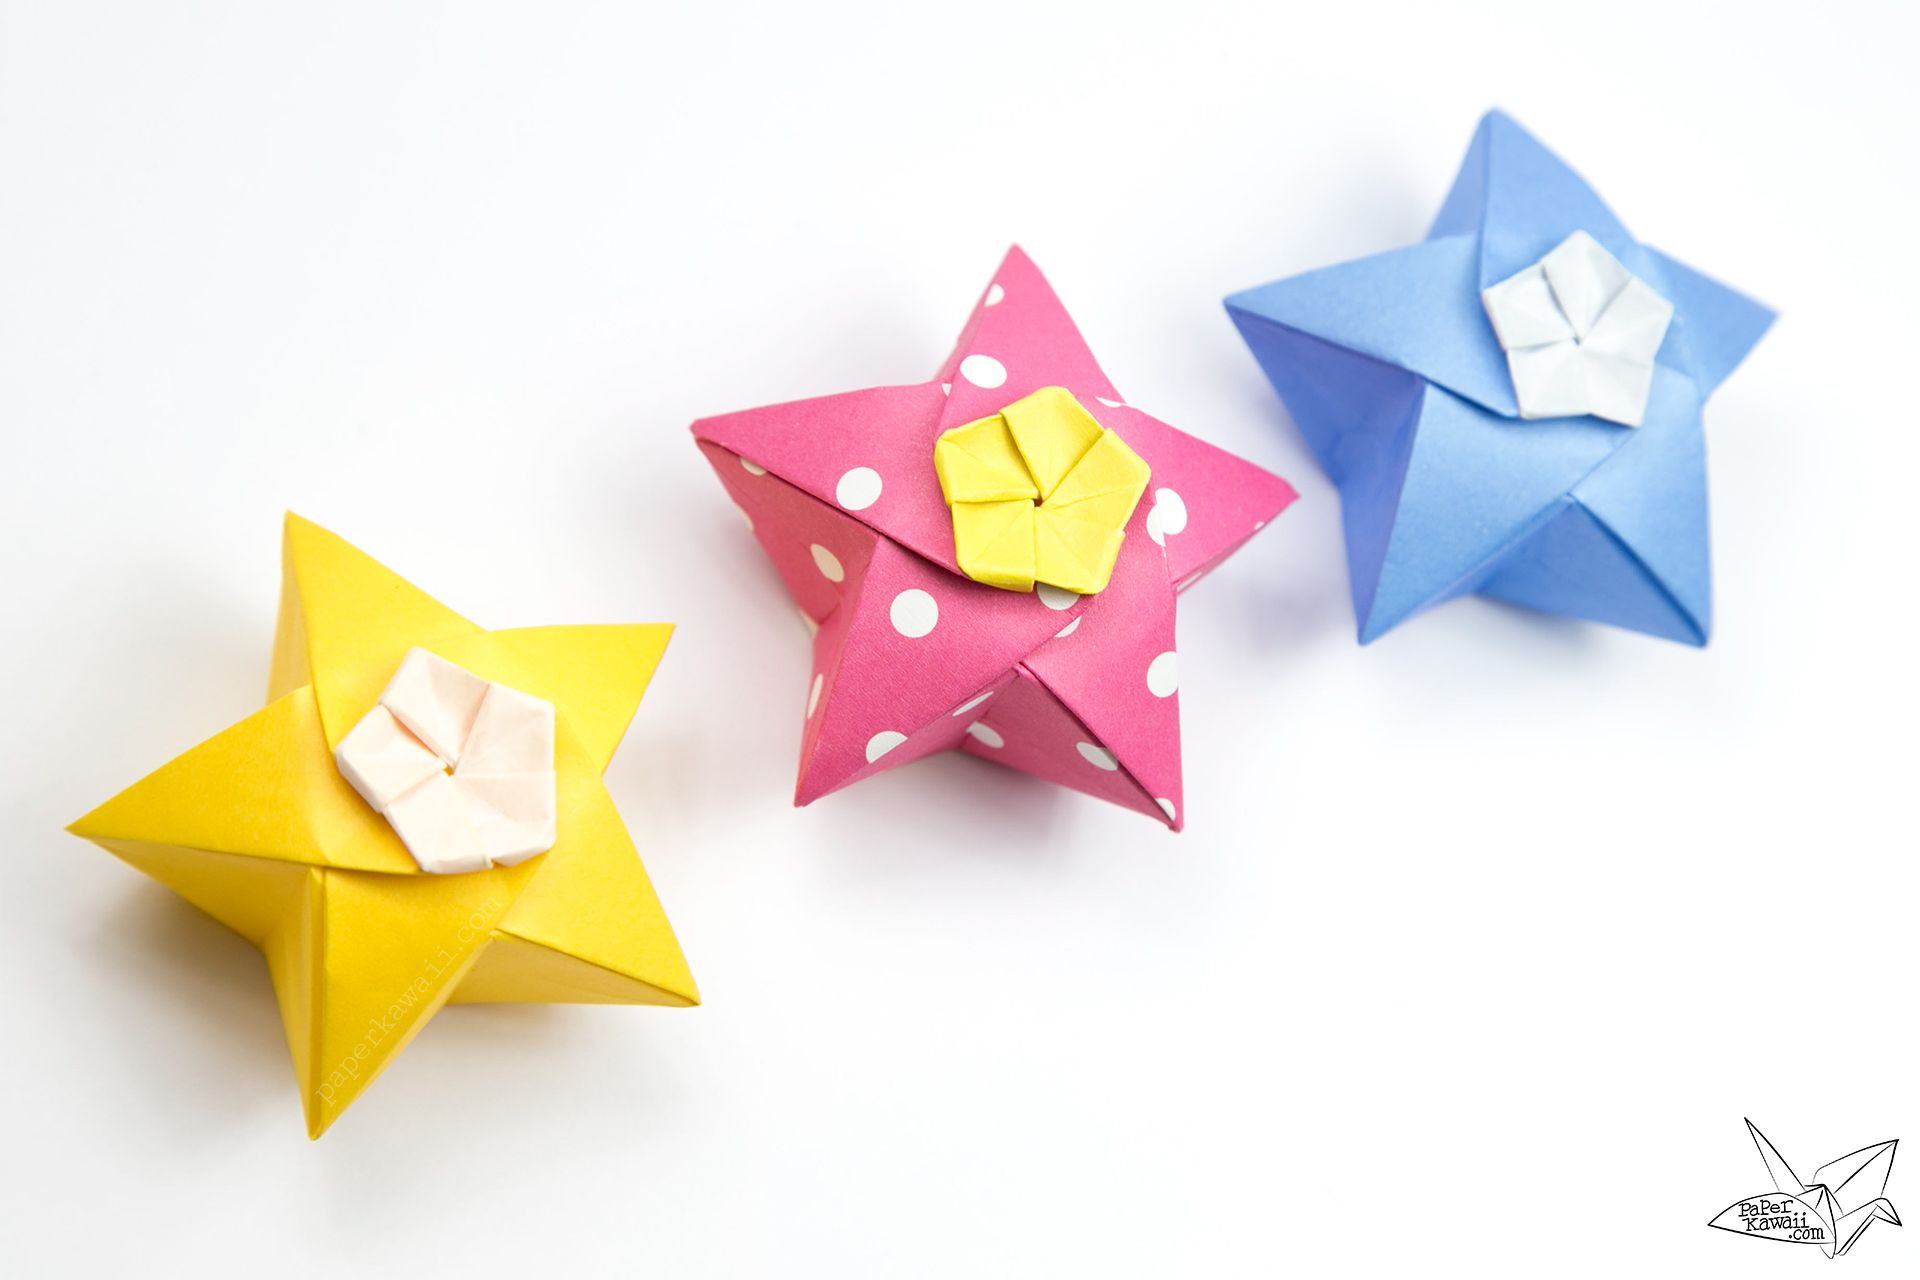 Origami Twinkle Star Tutorial - Puffy Stars | M's origami ... - photo#7